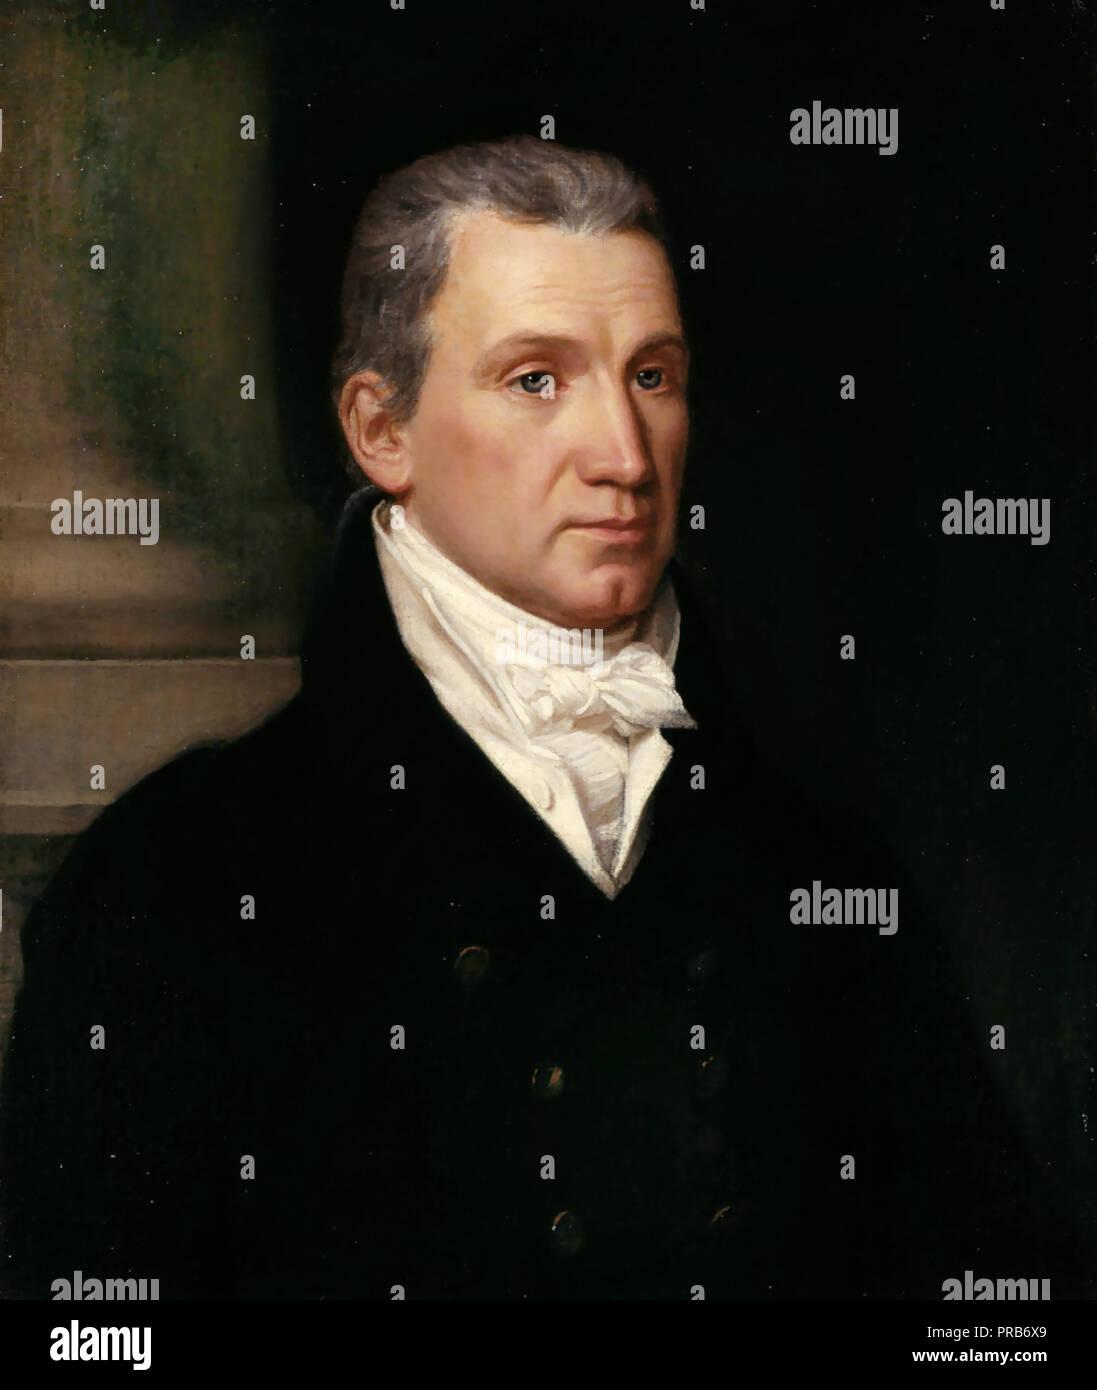 John Vanderlyn, James Monroe 1816 Oil on canvas, National Portrait Gallery, Washington, D.C., USA. Stock Photo